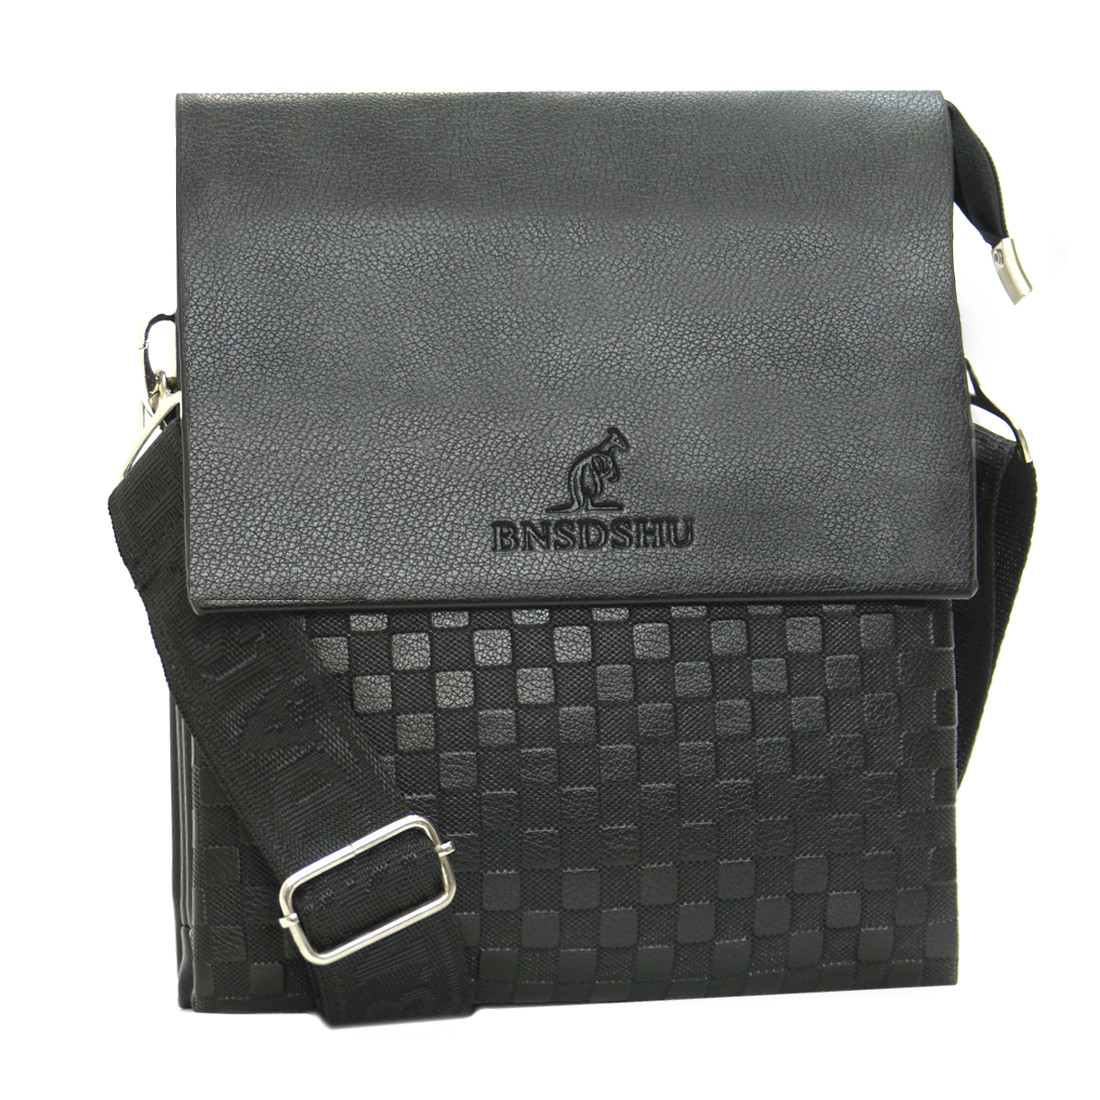 Мужская сумка-мессенджер BNSDSHU вертикальная 21х26х6  м Н2-1ч